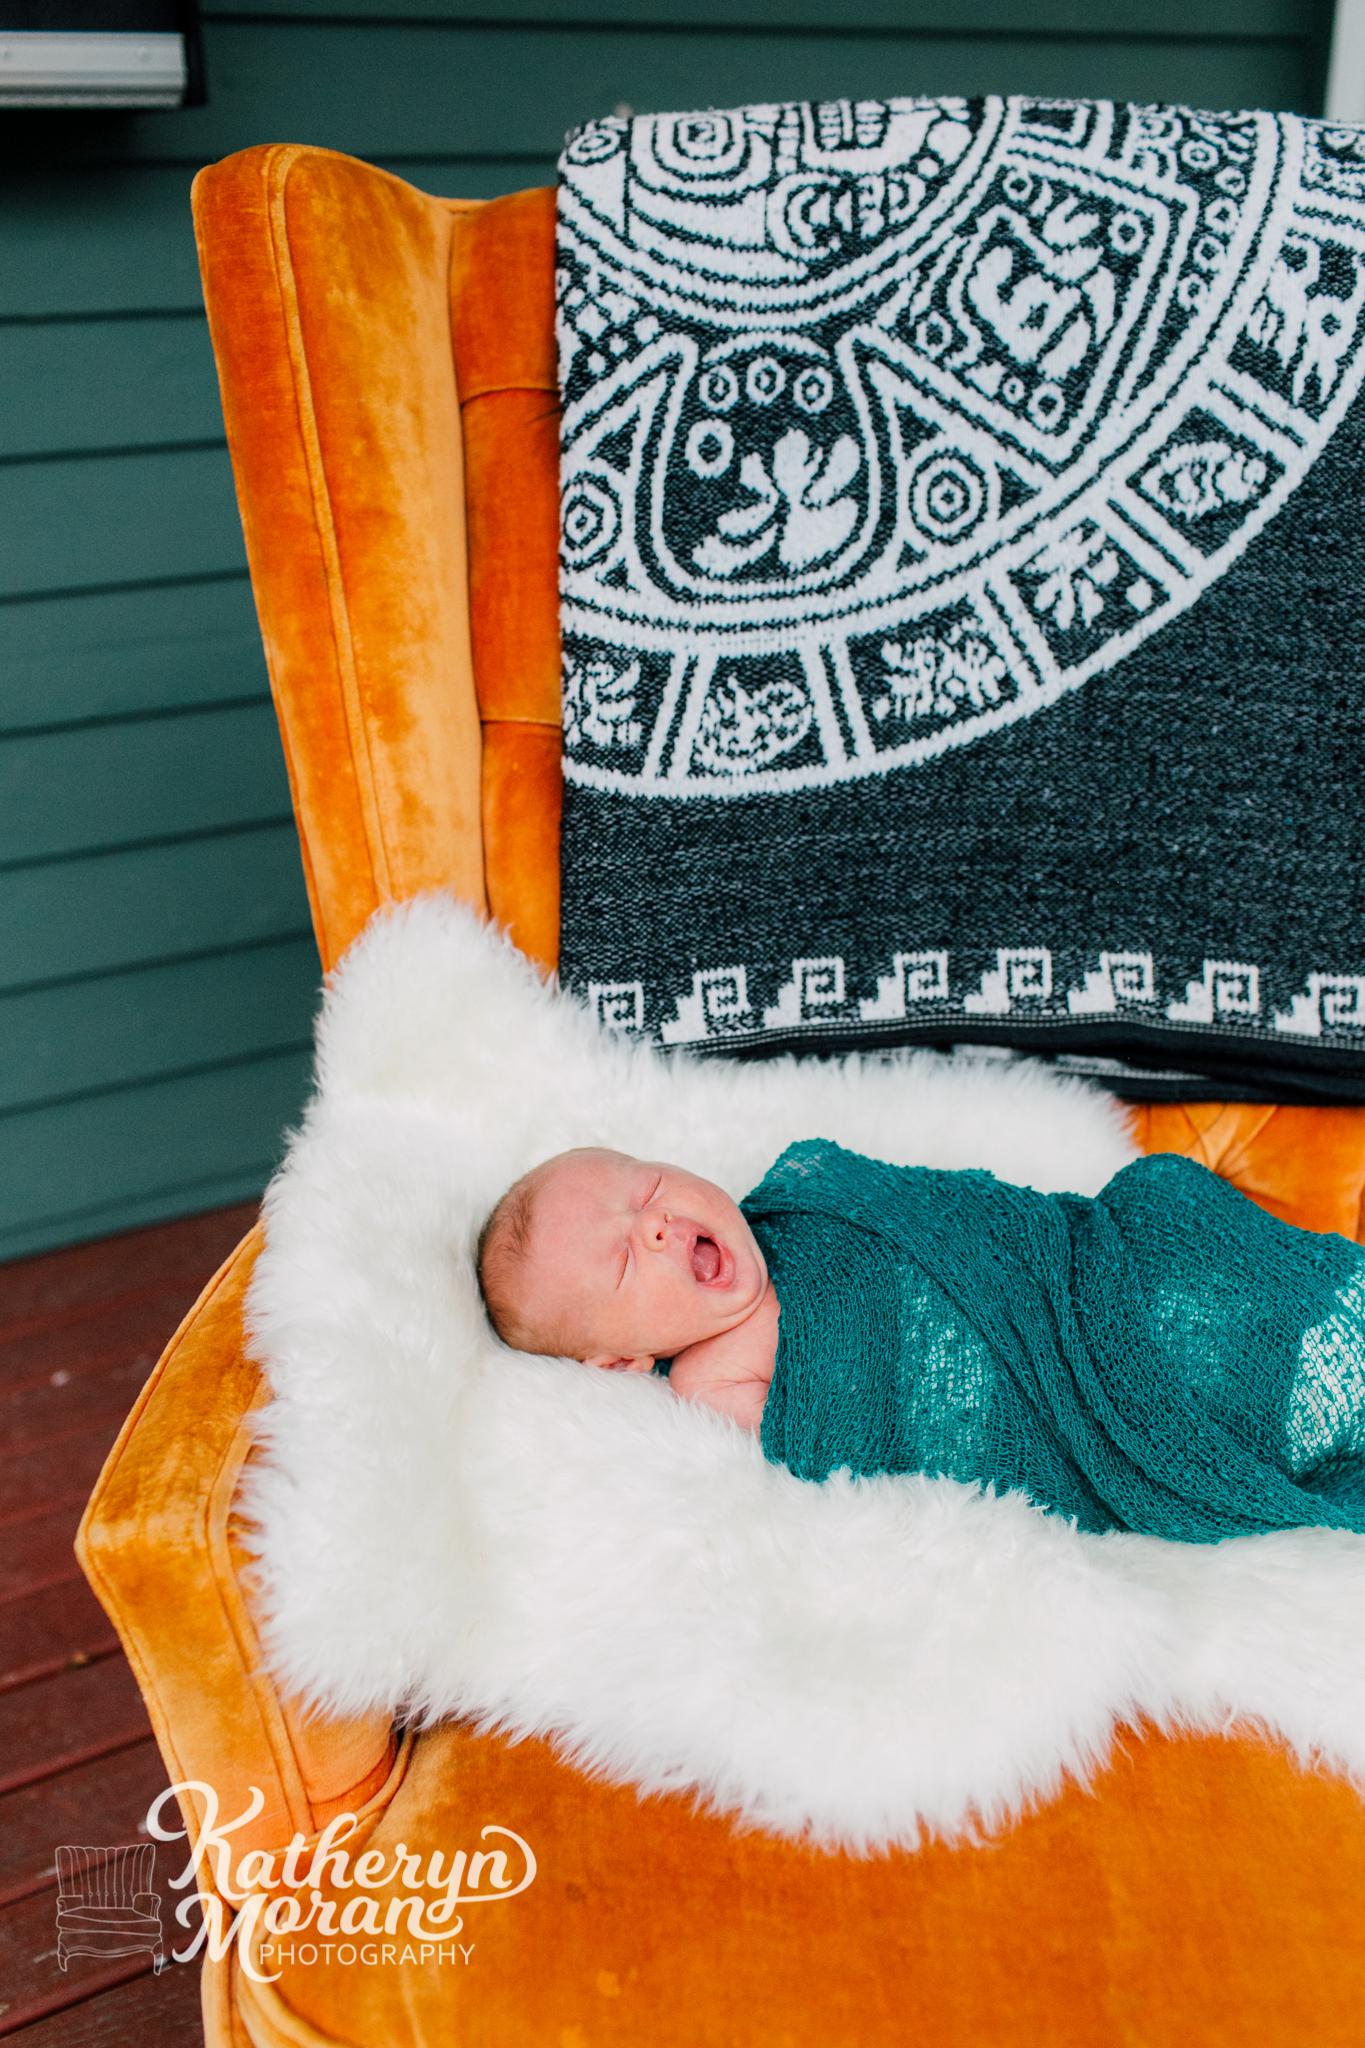 seattle-newborn-photographer-katheryn-moran-avery-malaspino-14.jpg